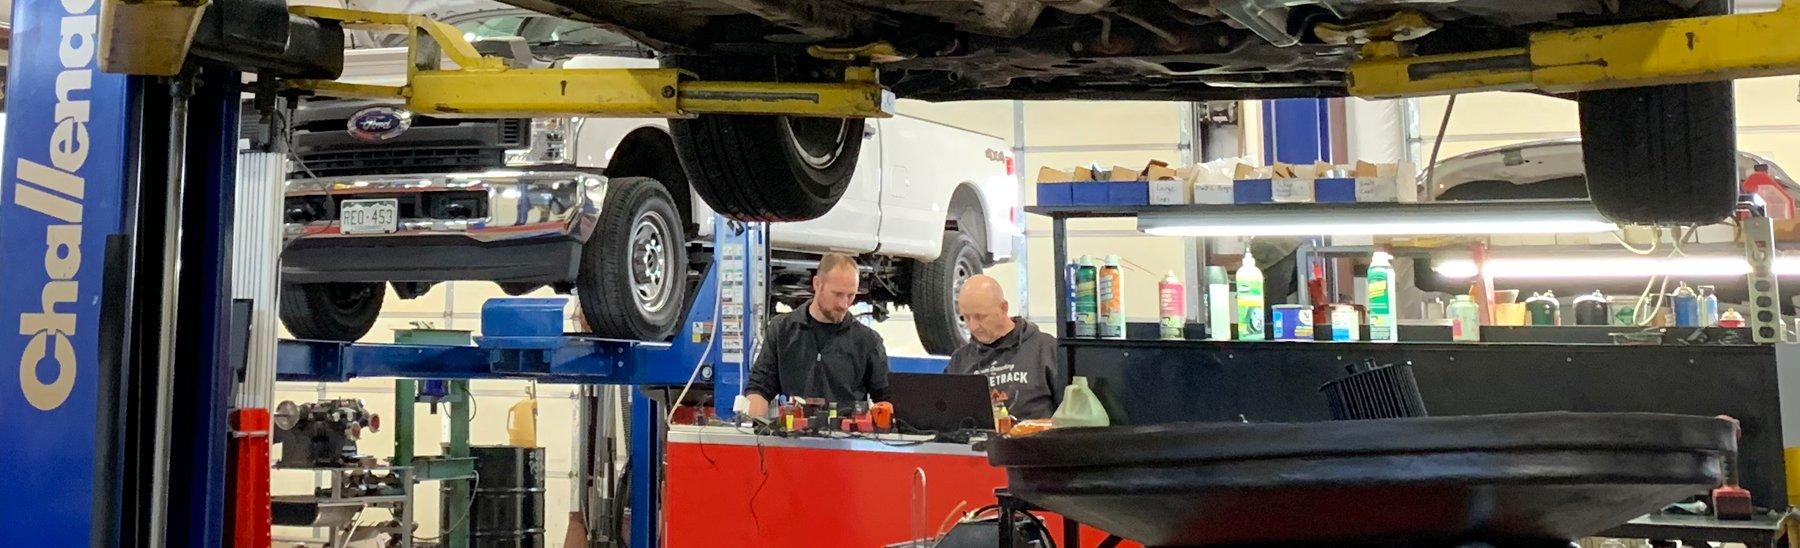 colchin-auto-repair-service-arvada-reviews